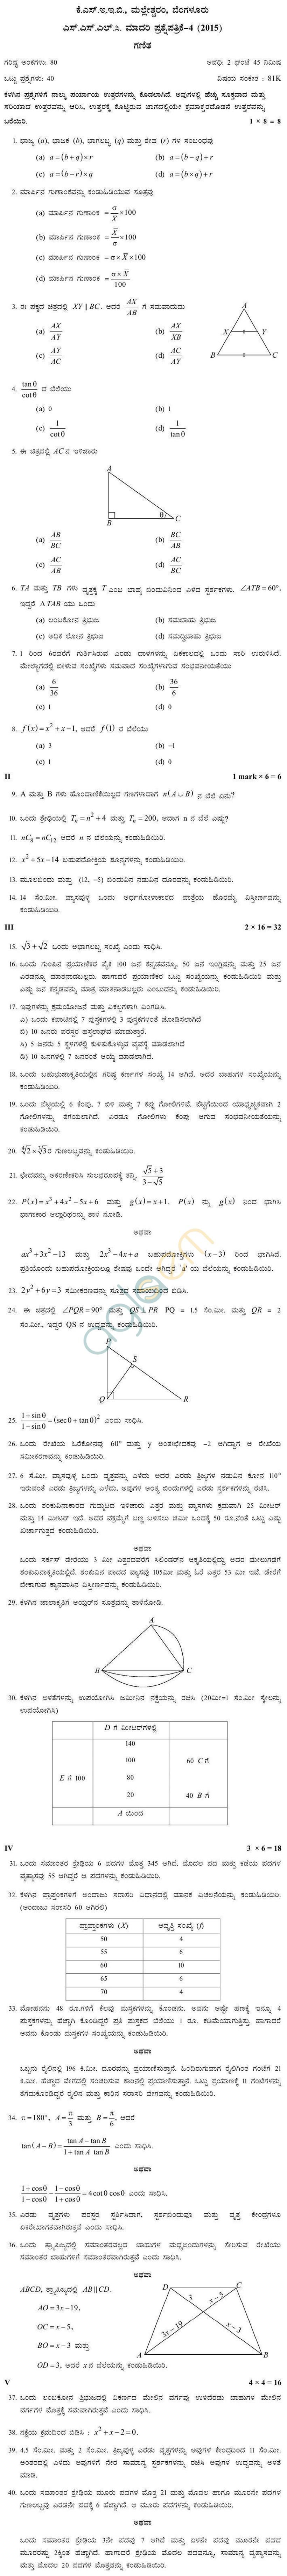 Karnataka Board SSLC Model Question Papers 2015 forMaths